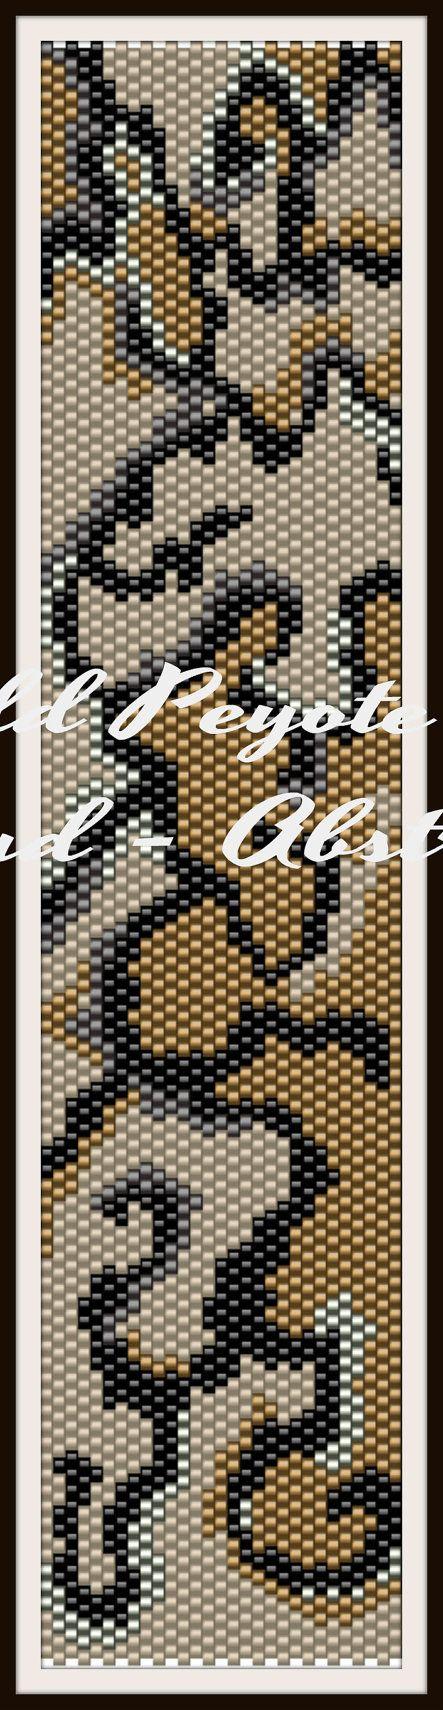 Odd Count Peyote Pattern  Beadwork  Peyote Cuff by BeadscapesbyEs